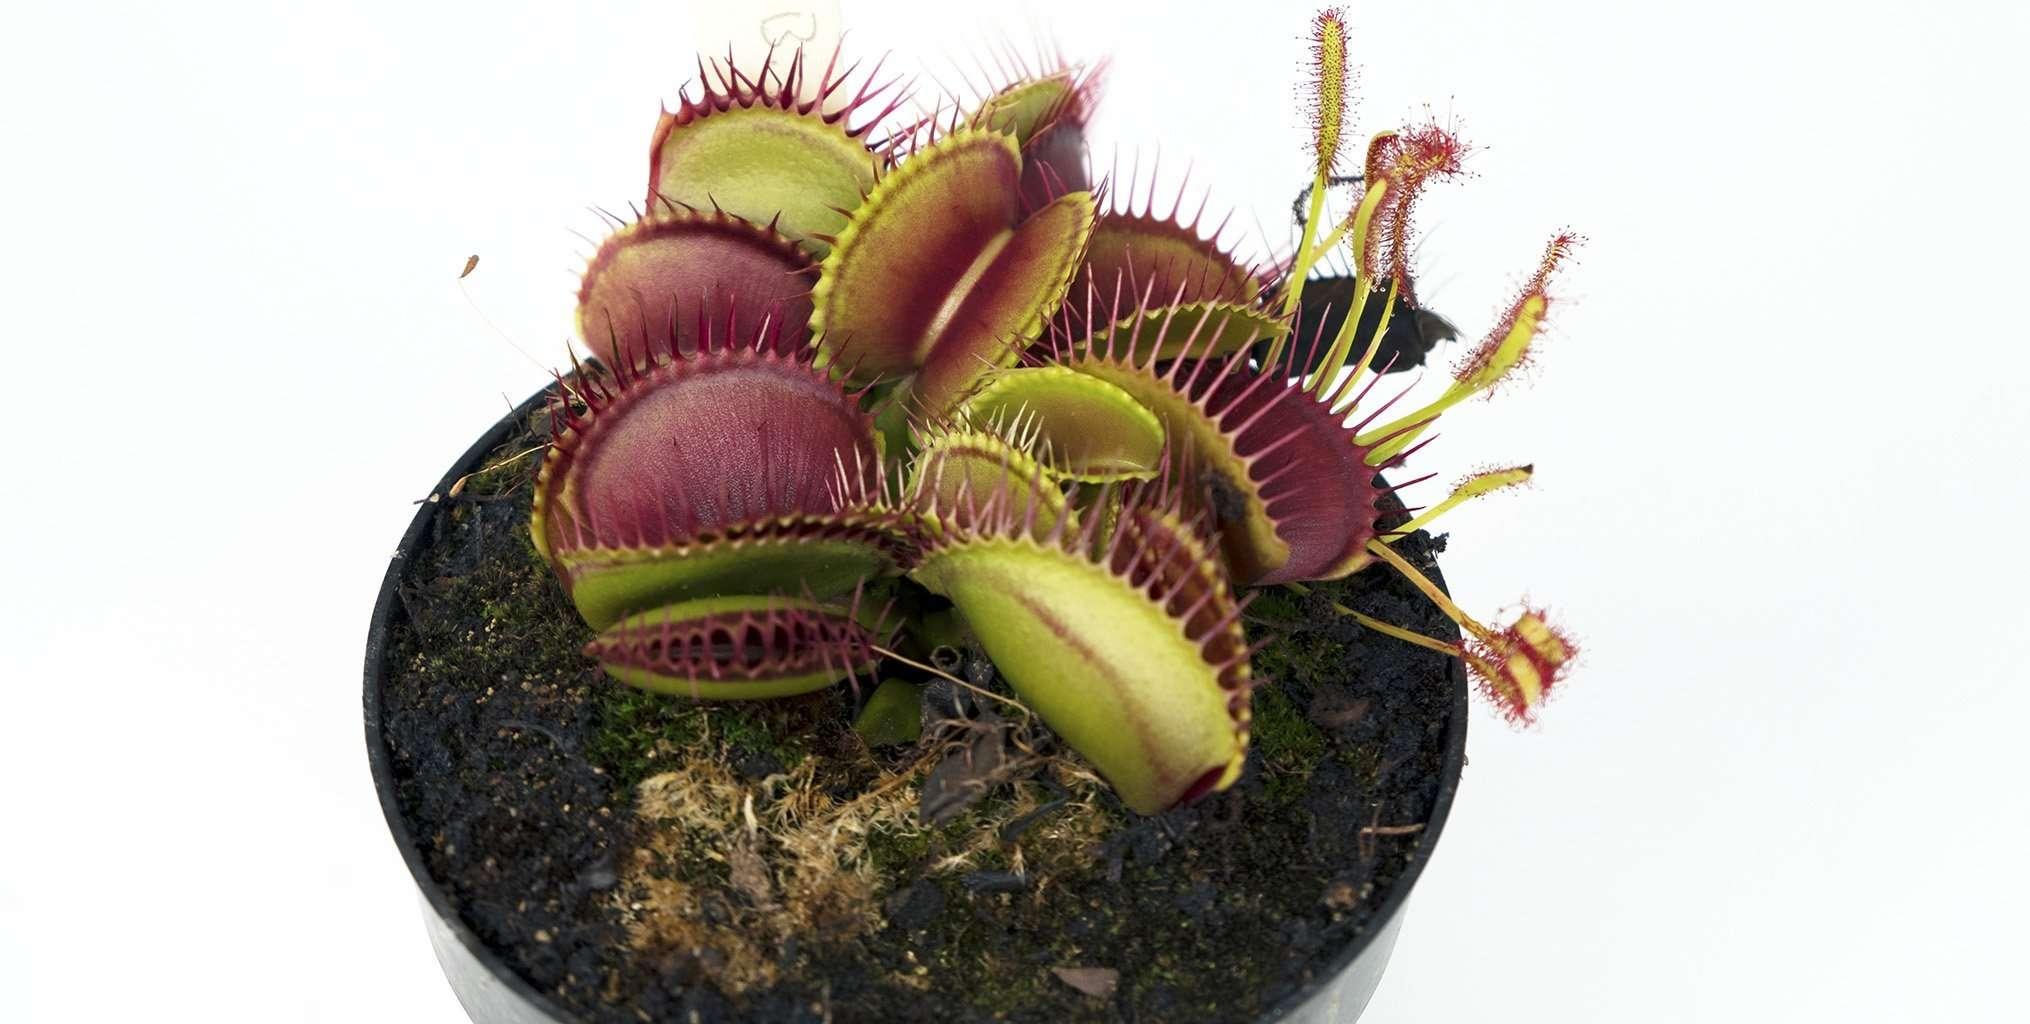 Dionaea Big Mouth Venus flytrap